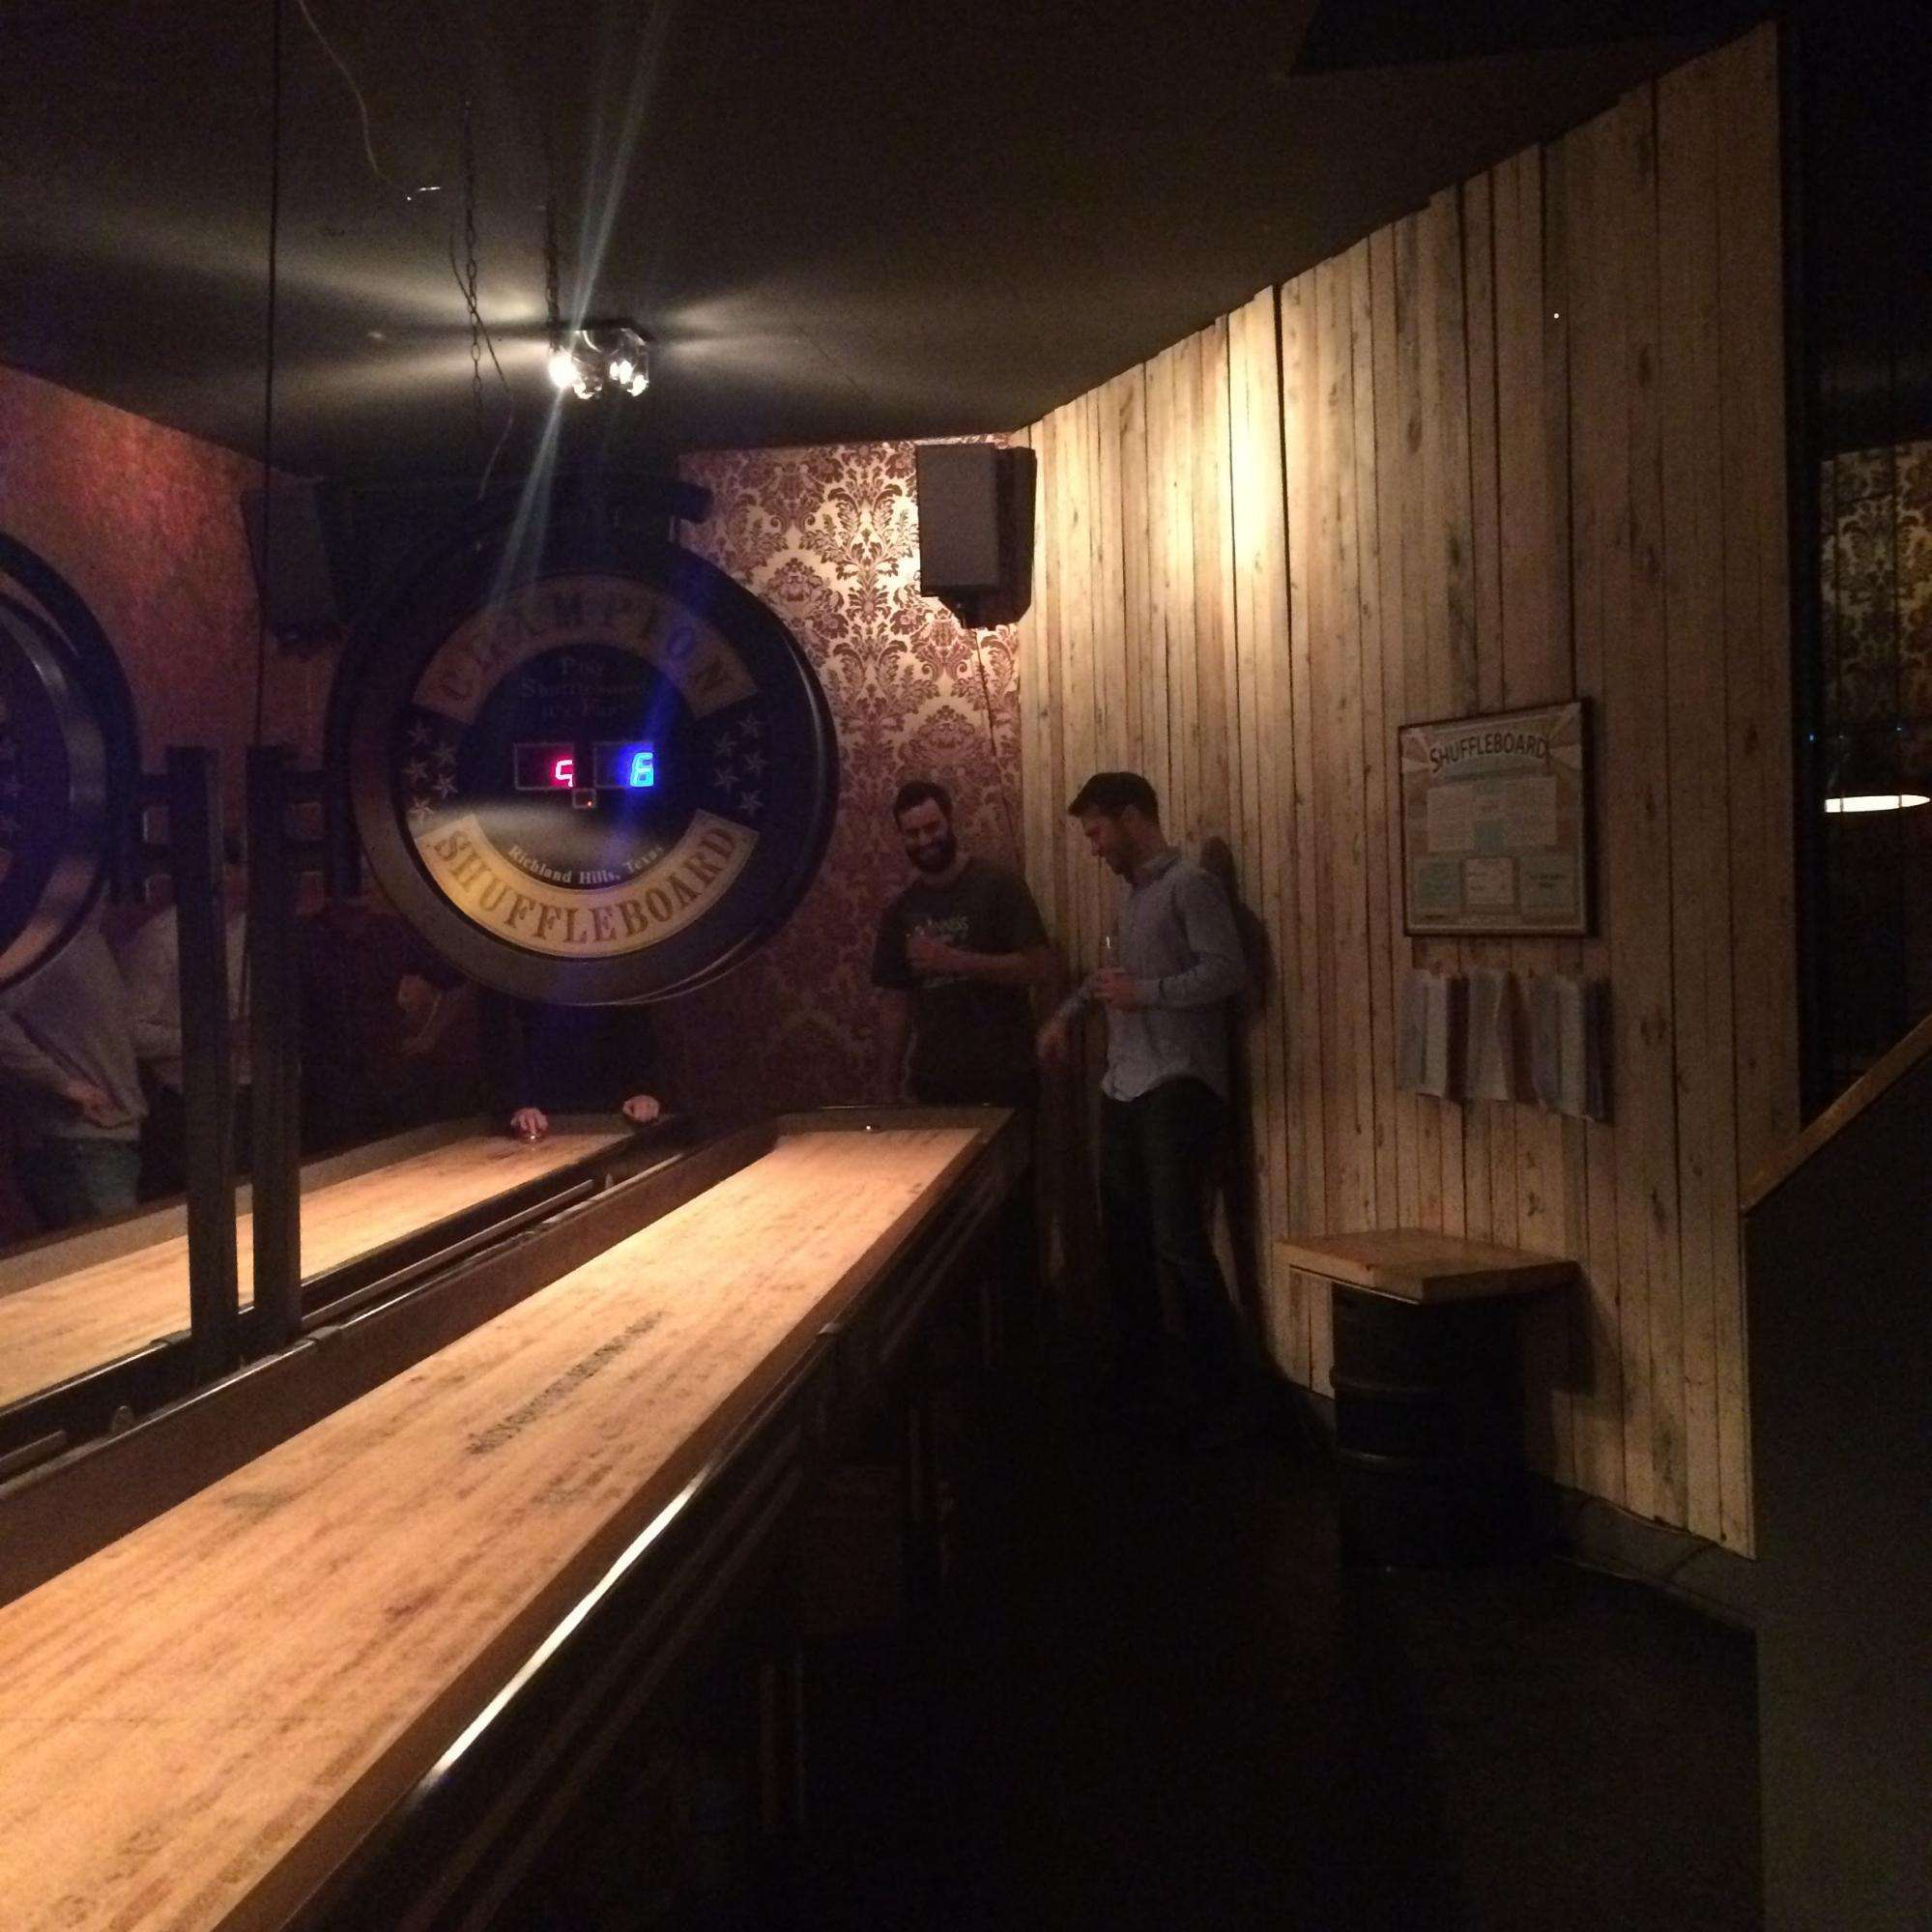 The Shuffleboards at Kaschk